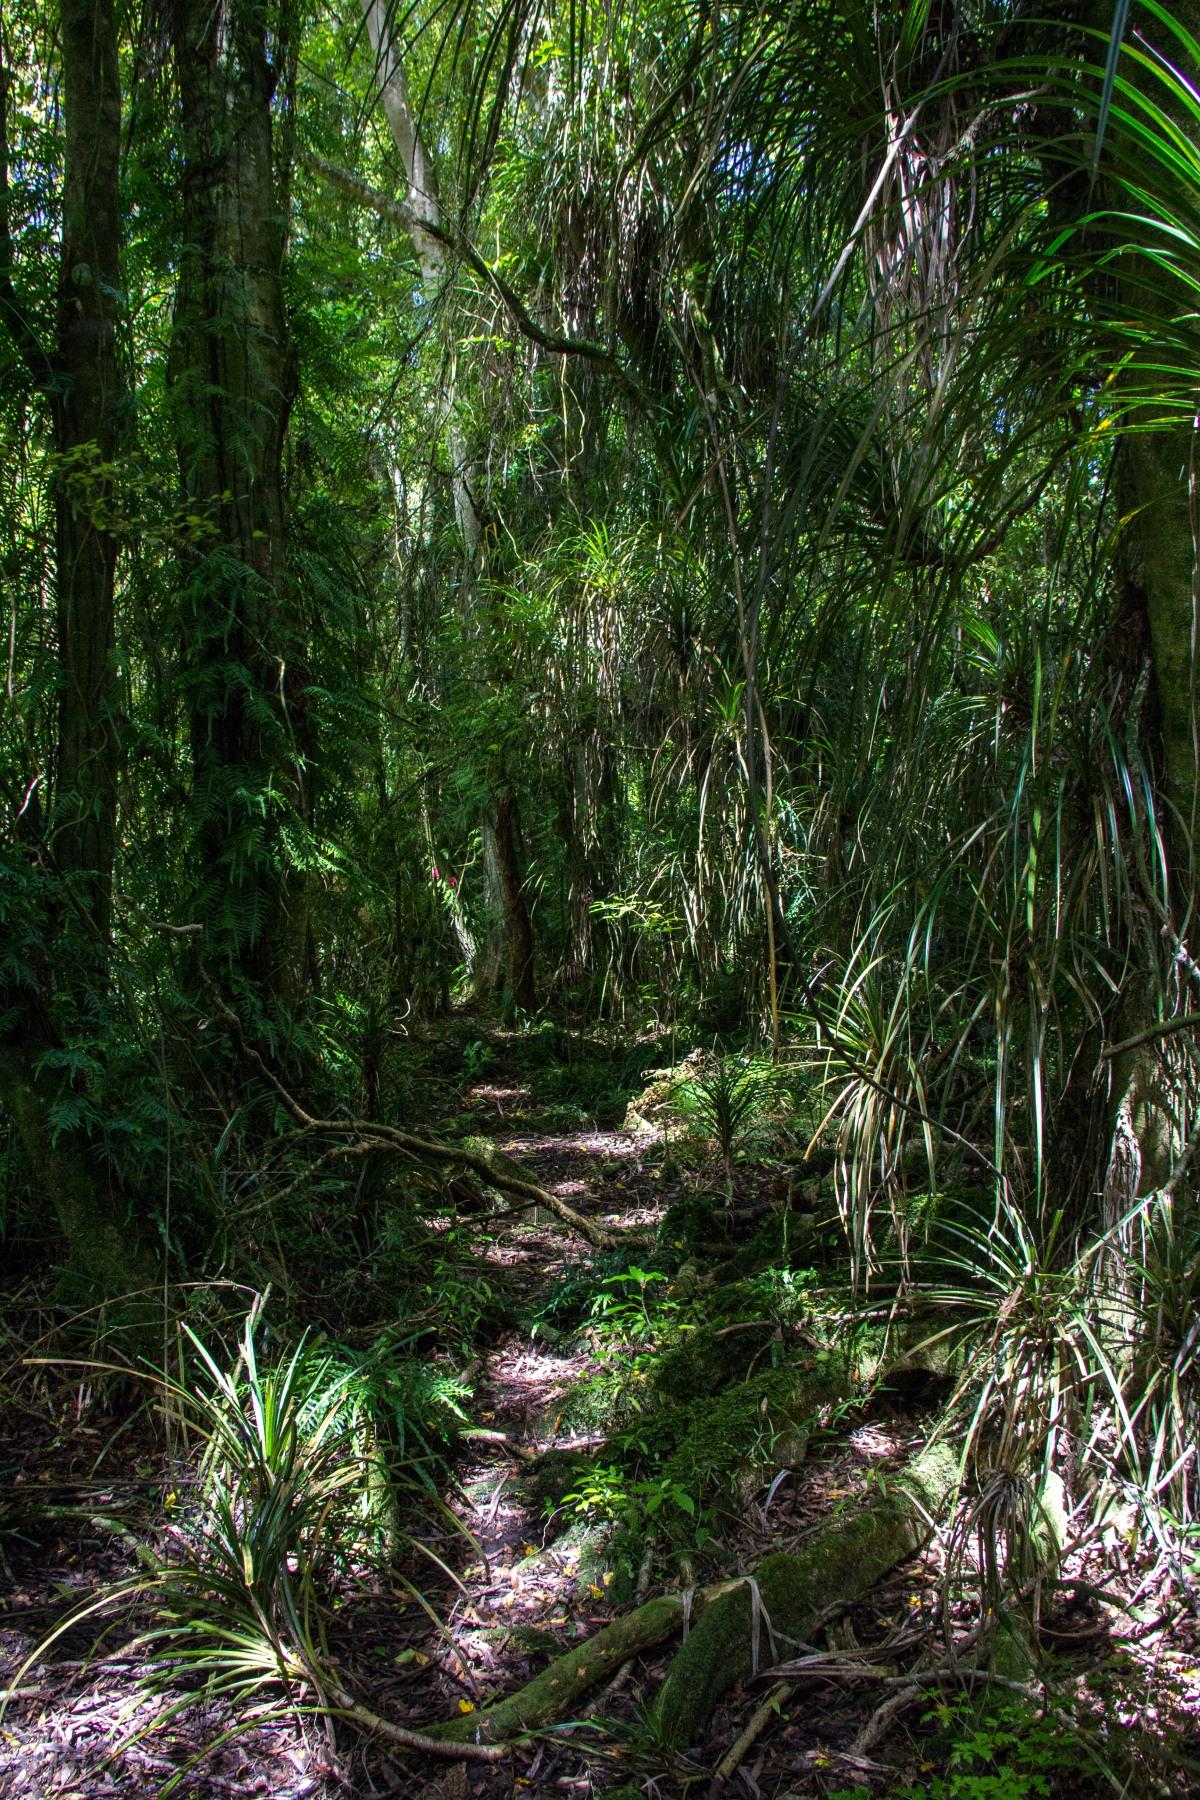 Jurassic path3